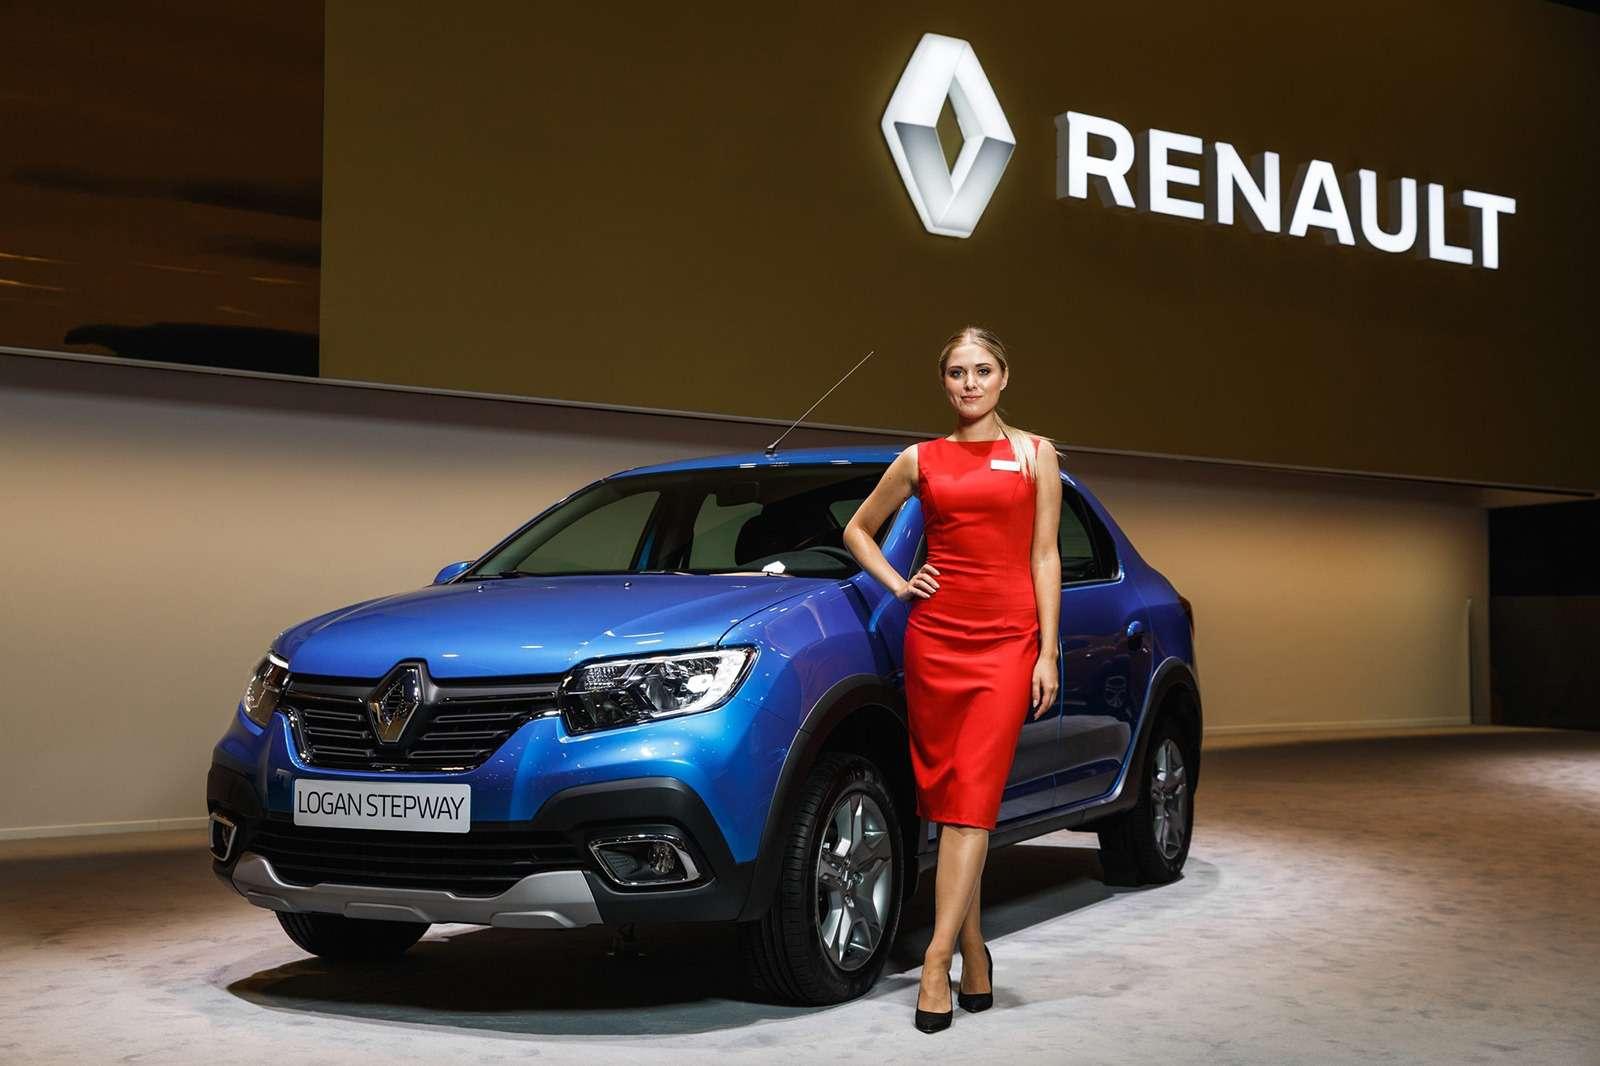 Renault объявила цены наLogan Stepway иSandero Stepway— фото 913032